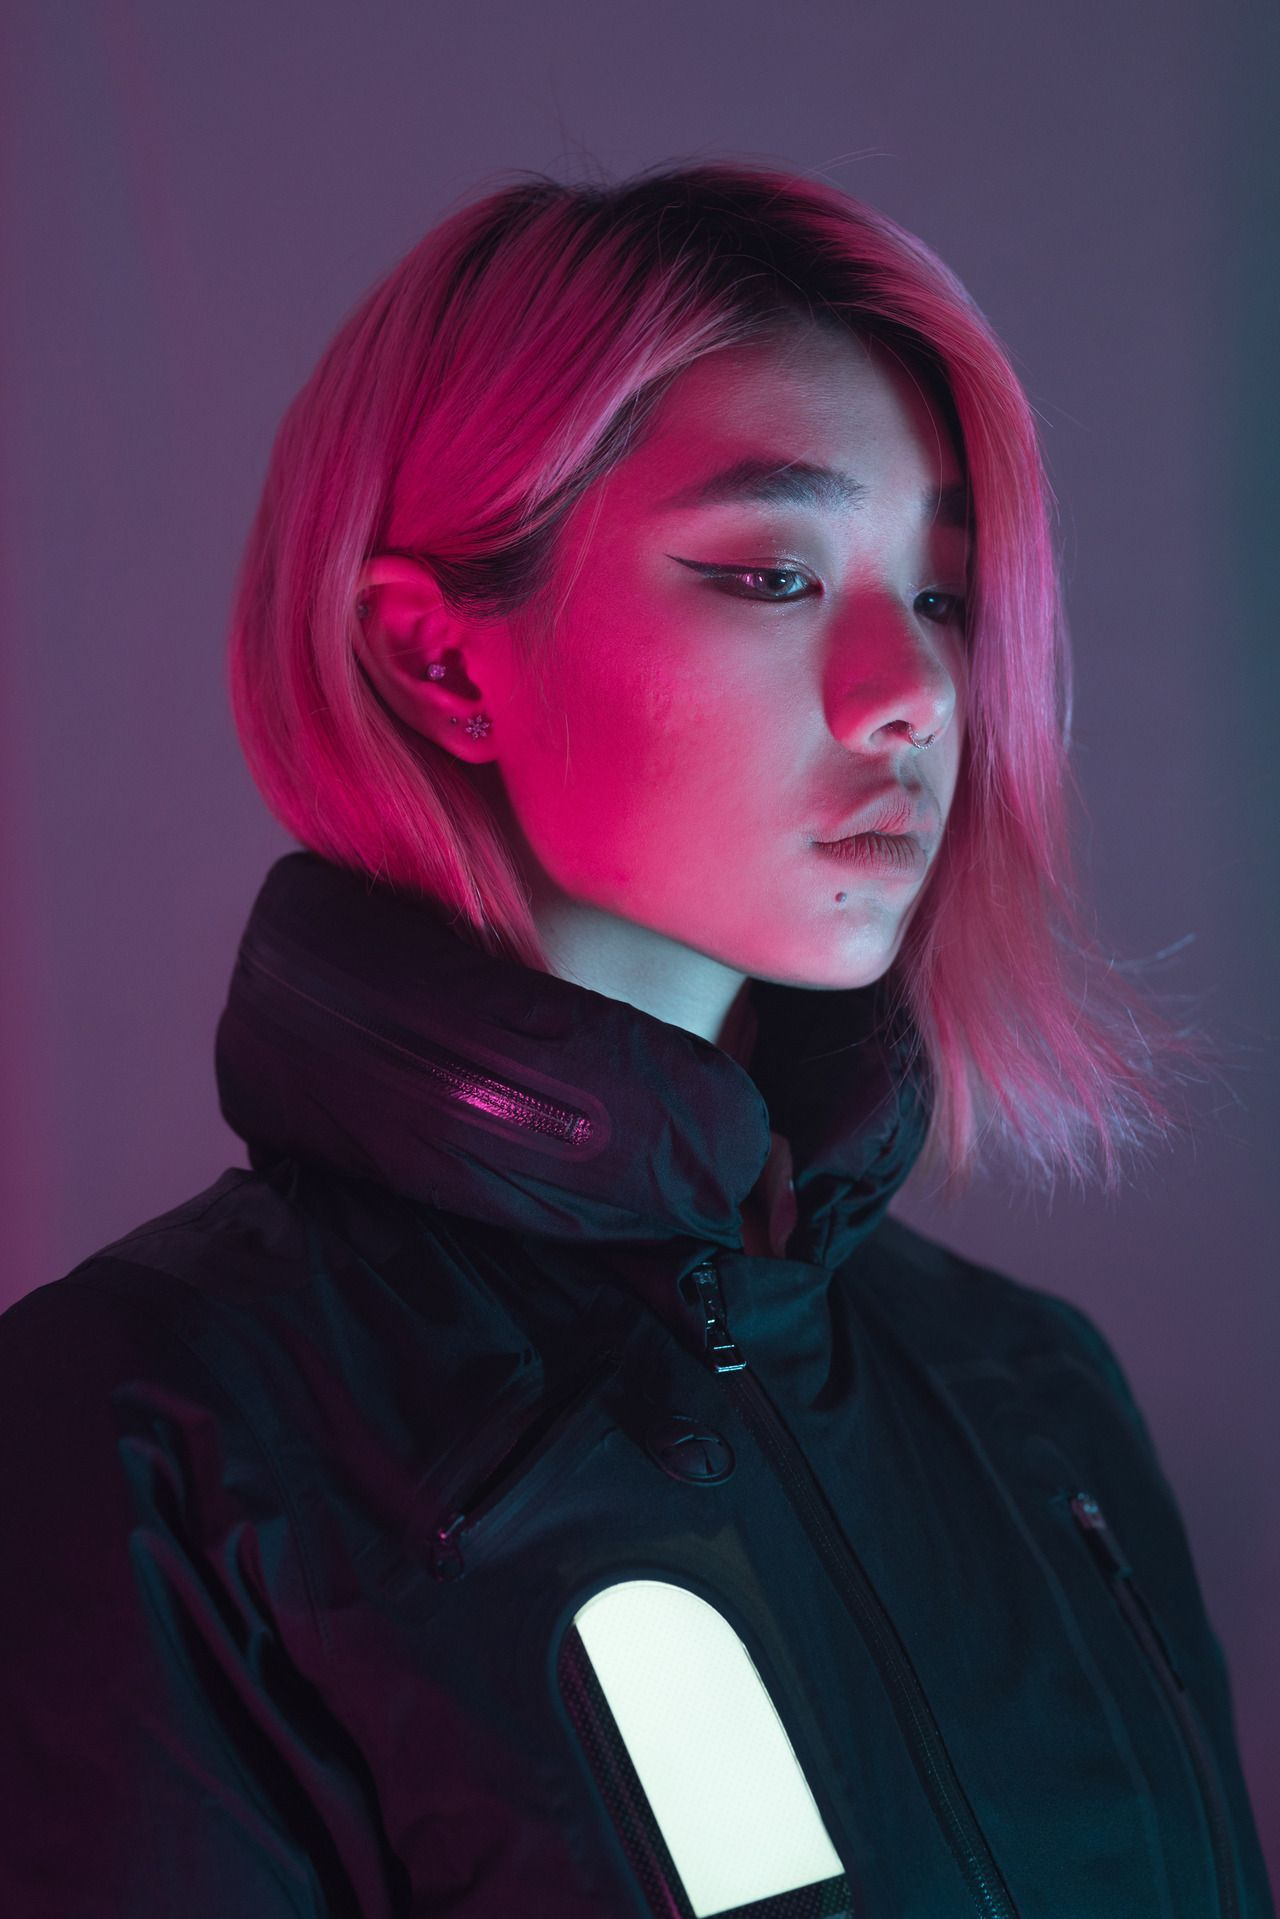 Jennifer Bin Photo In 2020 Neon Photography Portrait Art Reference Photos